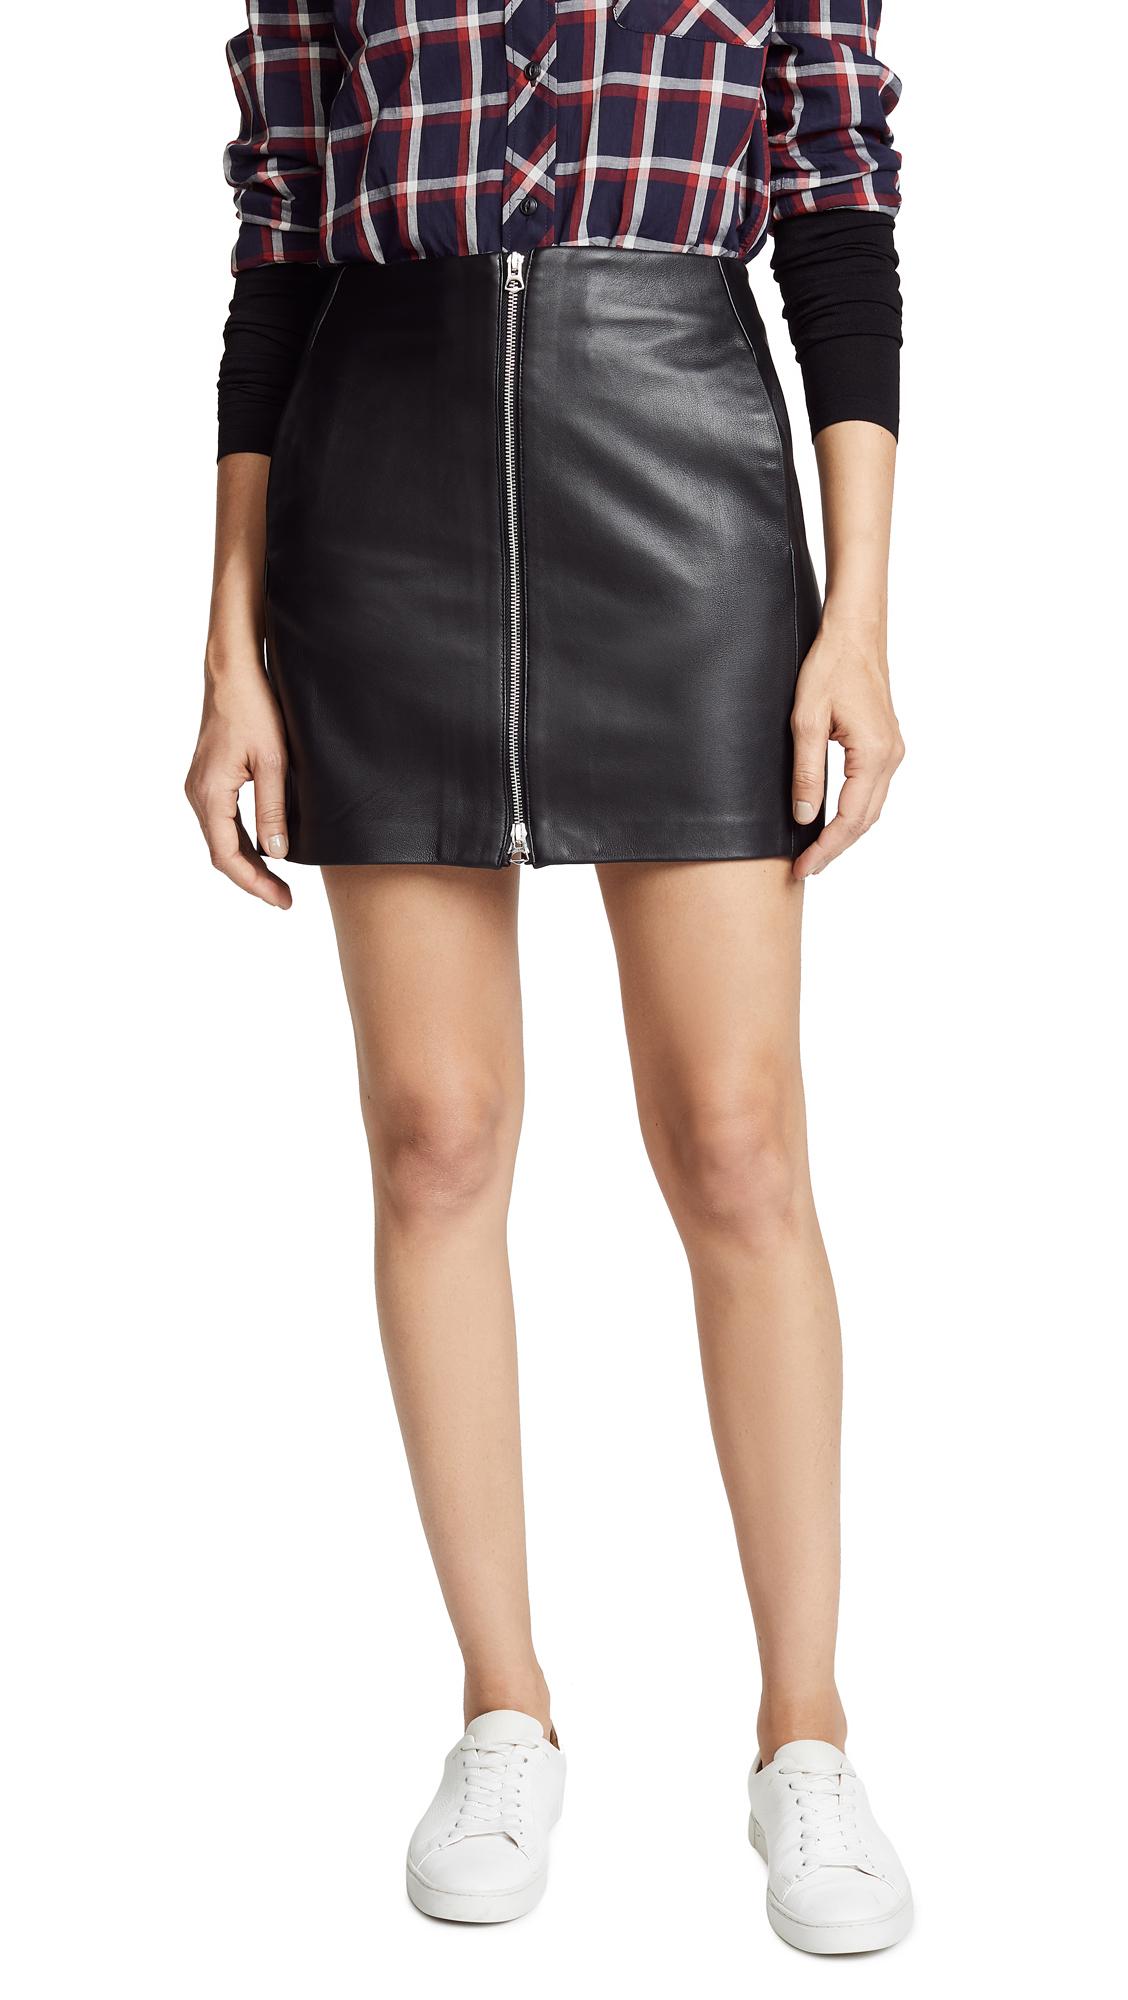 Rag & Bone/JEAN Heidi Leather Skirt In Black